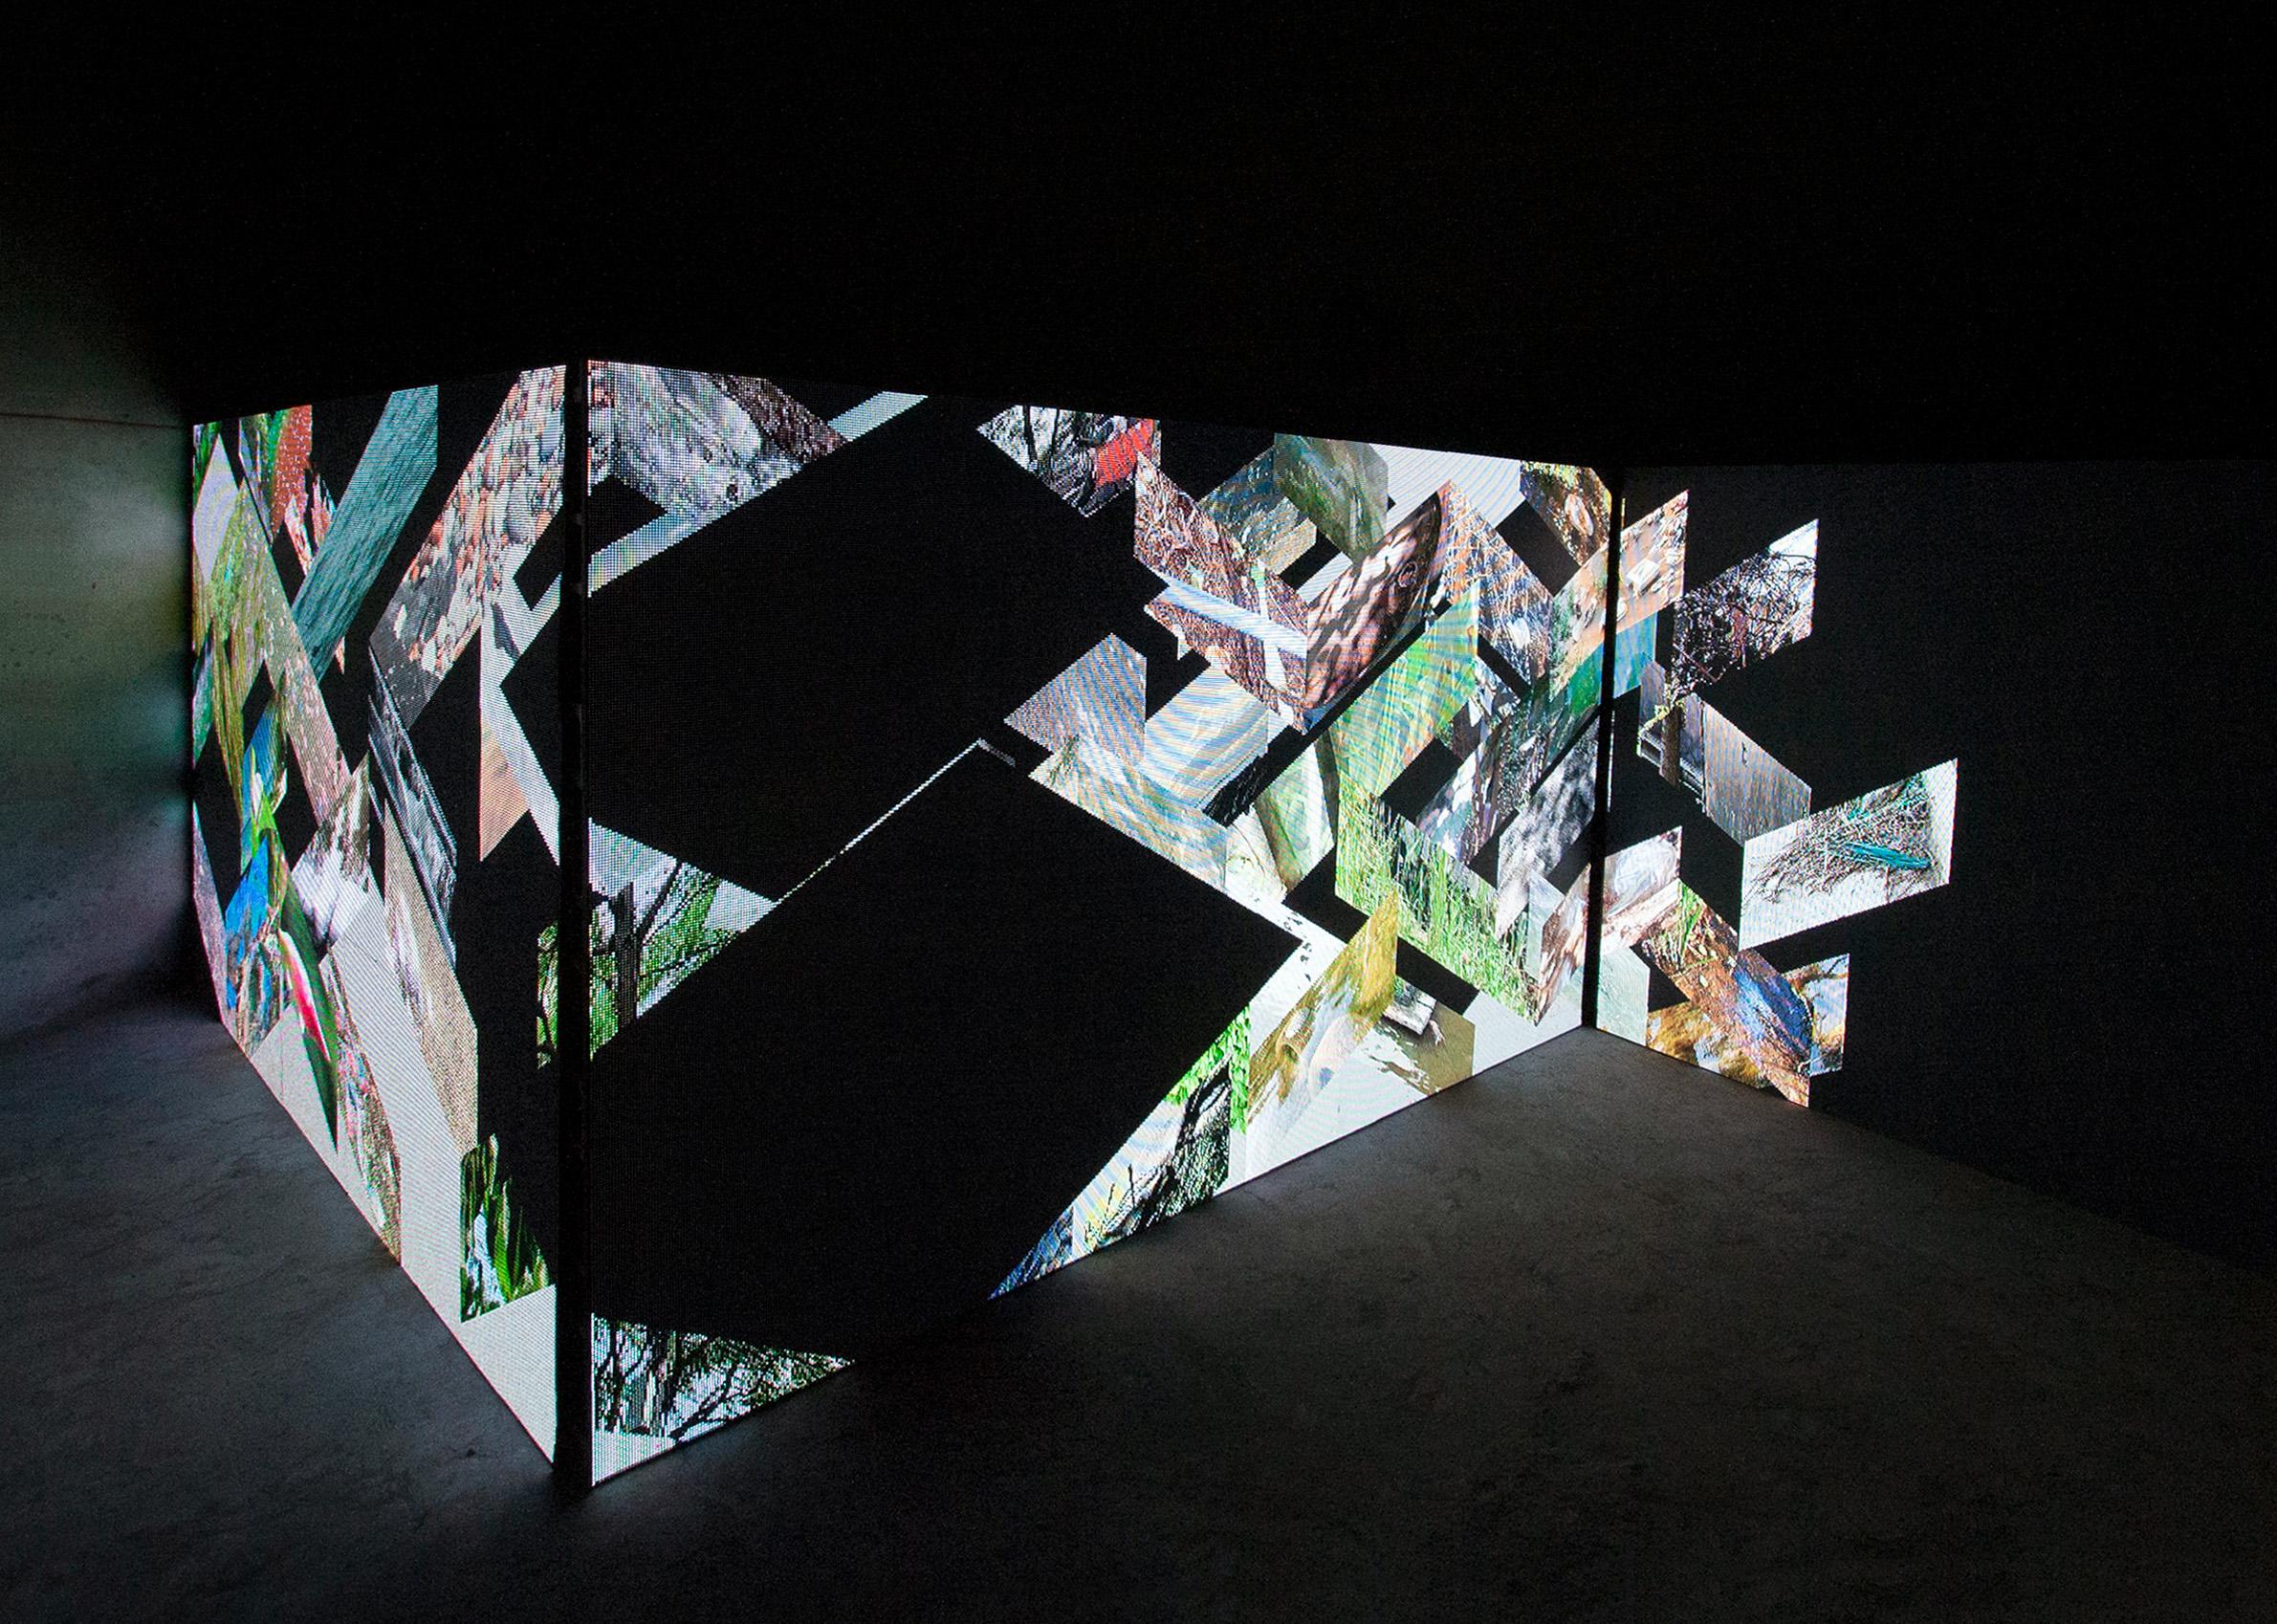 Lyla Rye, A Meditation, (installation view), 2019. Three-channel video. Courtesy of the artist. Photo: John Dickson.